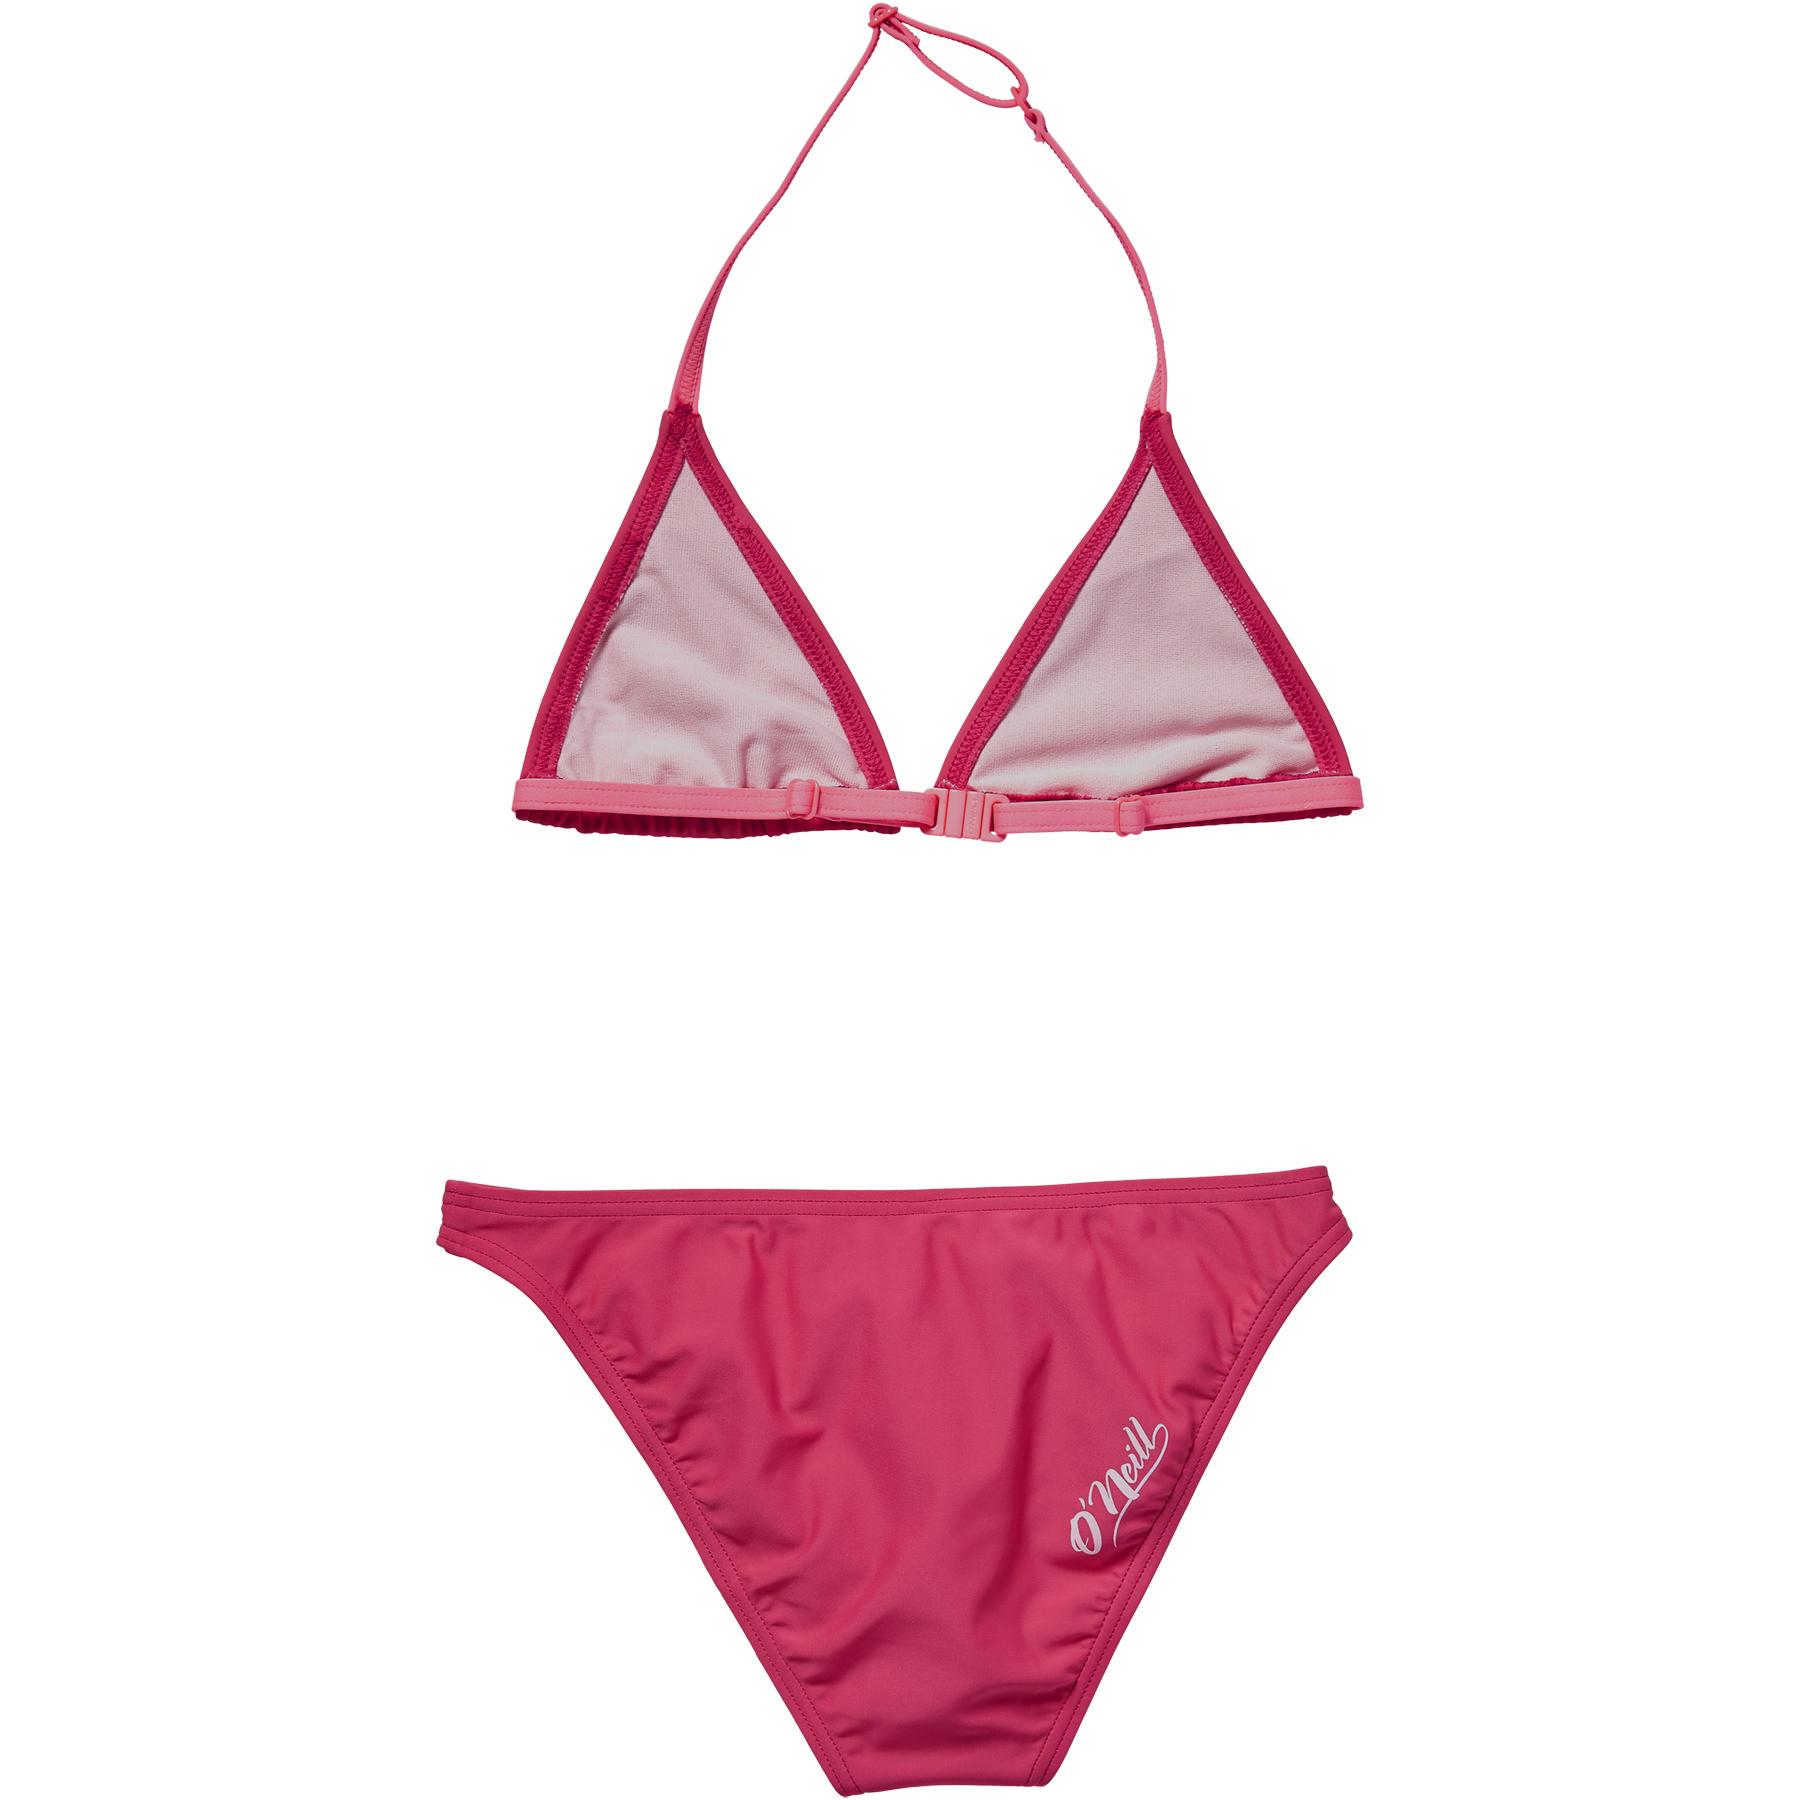 ONeill Structure Triangle Bikinis Bikini Fille